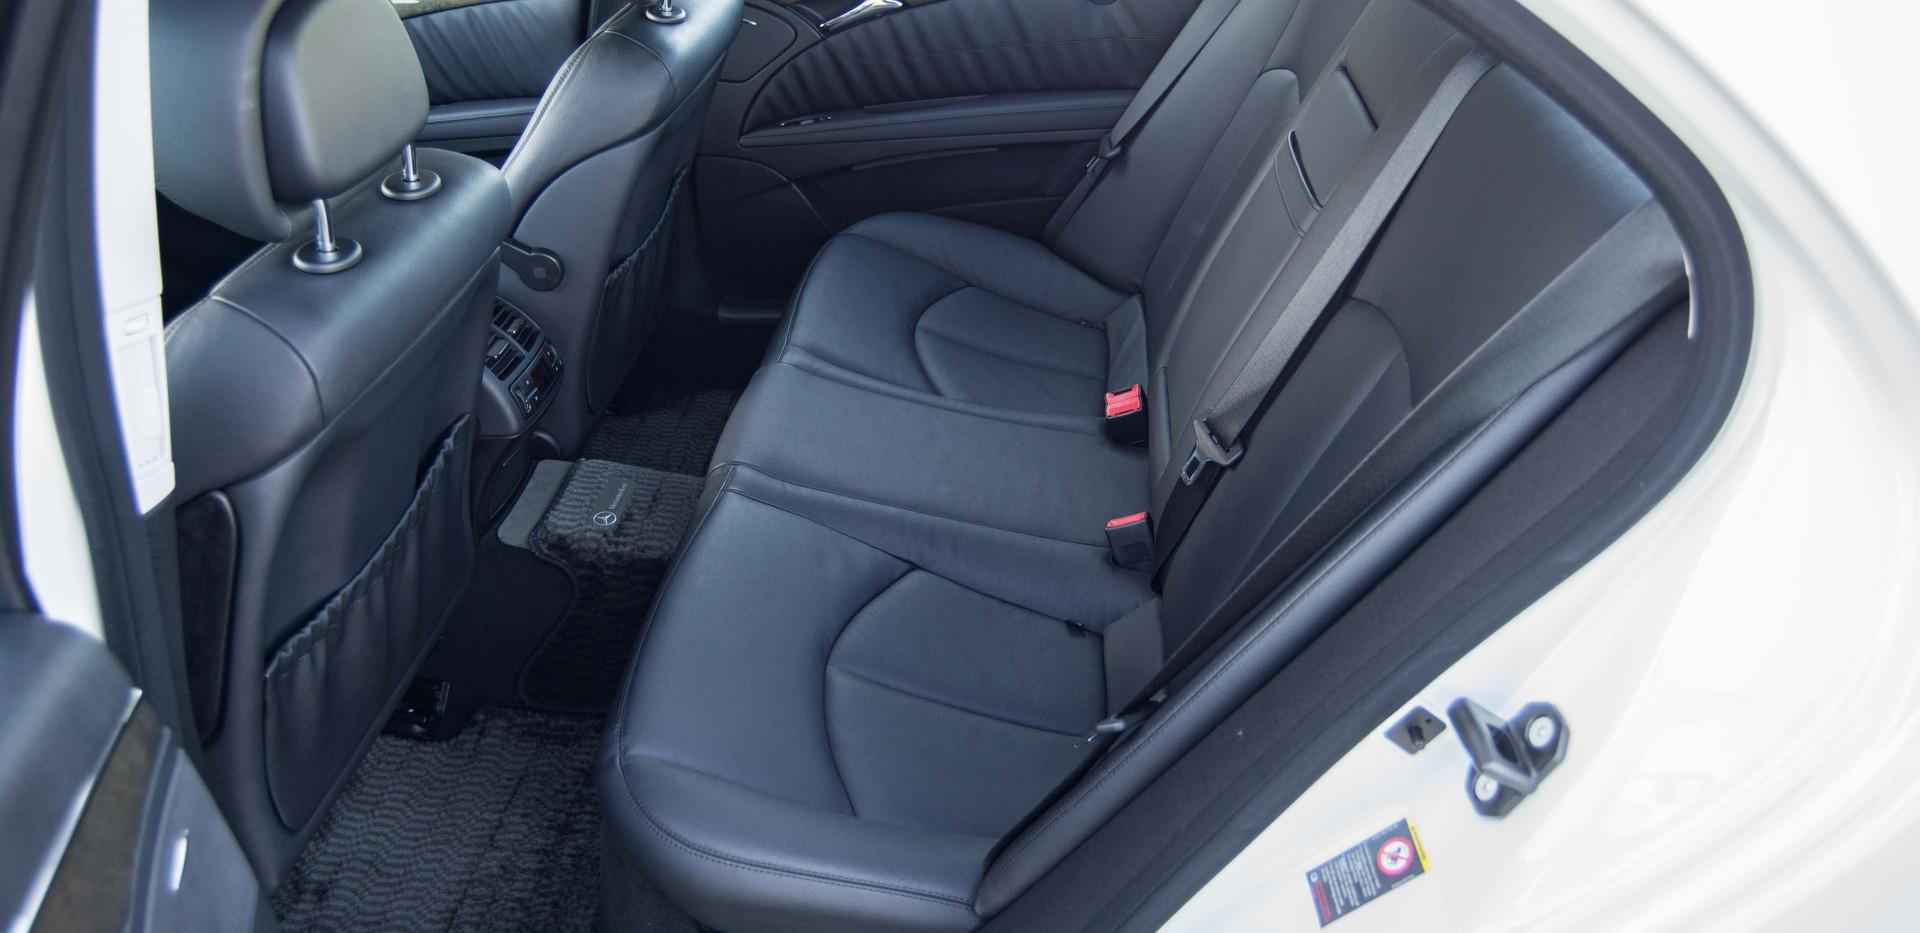 Mercedes E350 For Sale UK London  (49 of